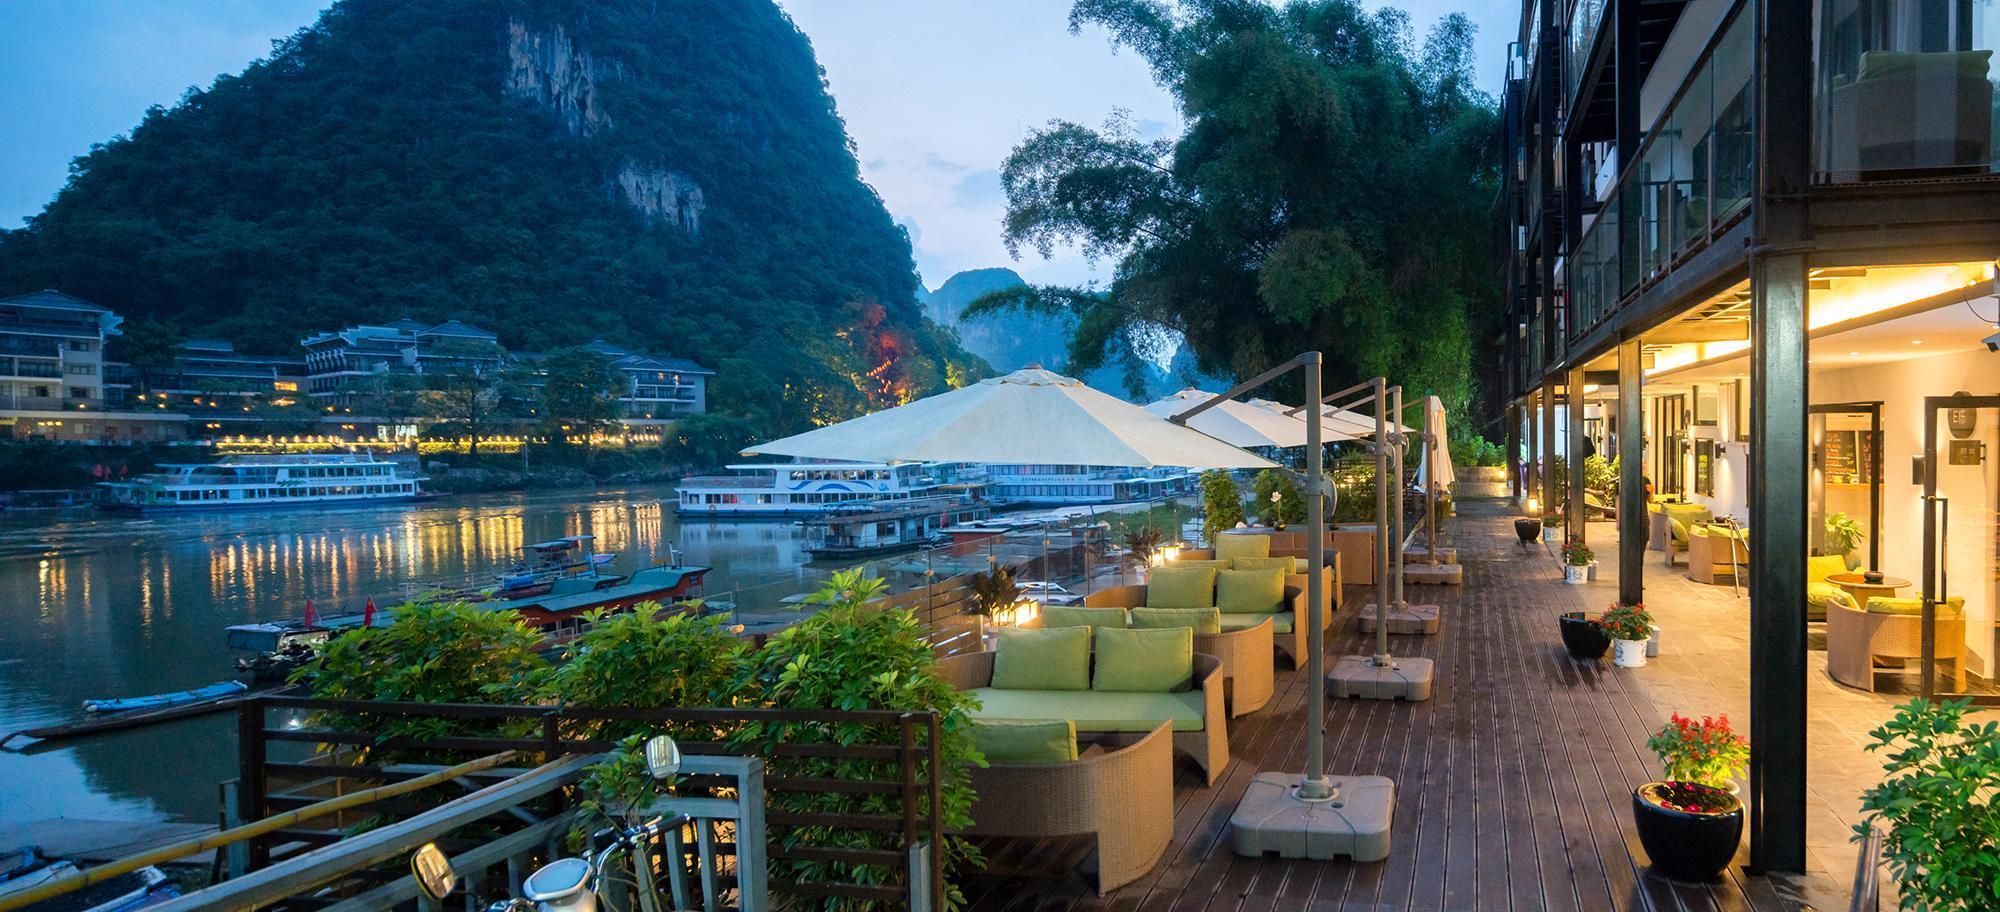 Sea Lily Yangshuo Riverside Resort